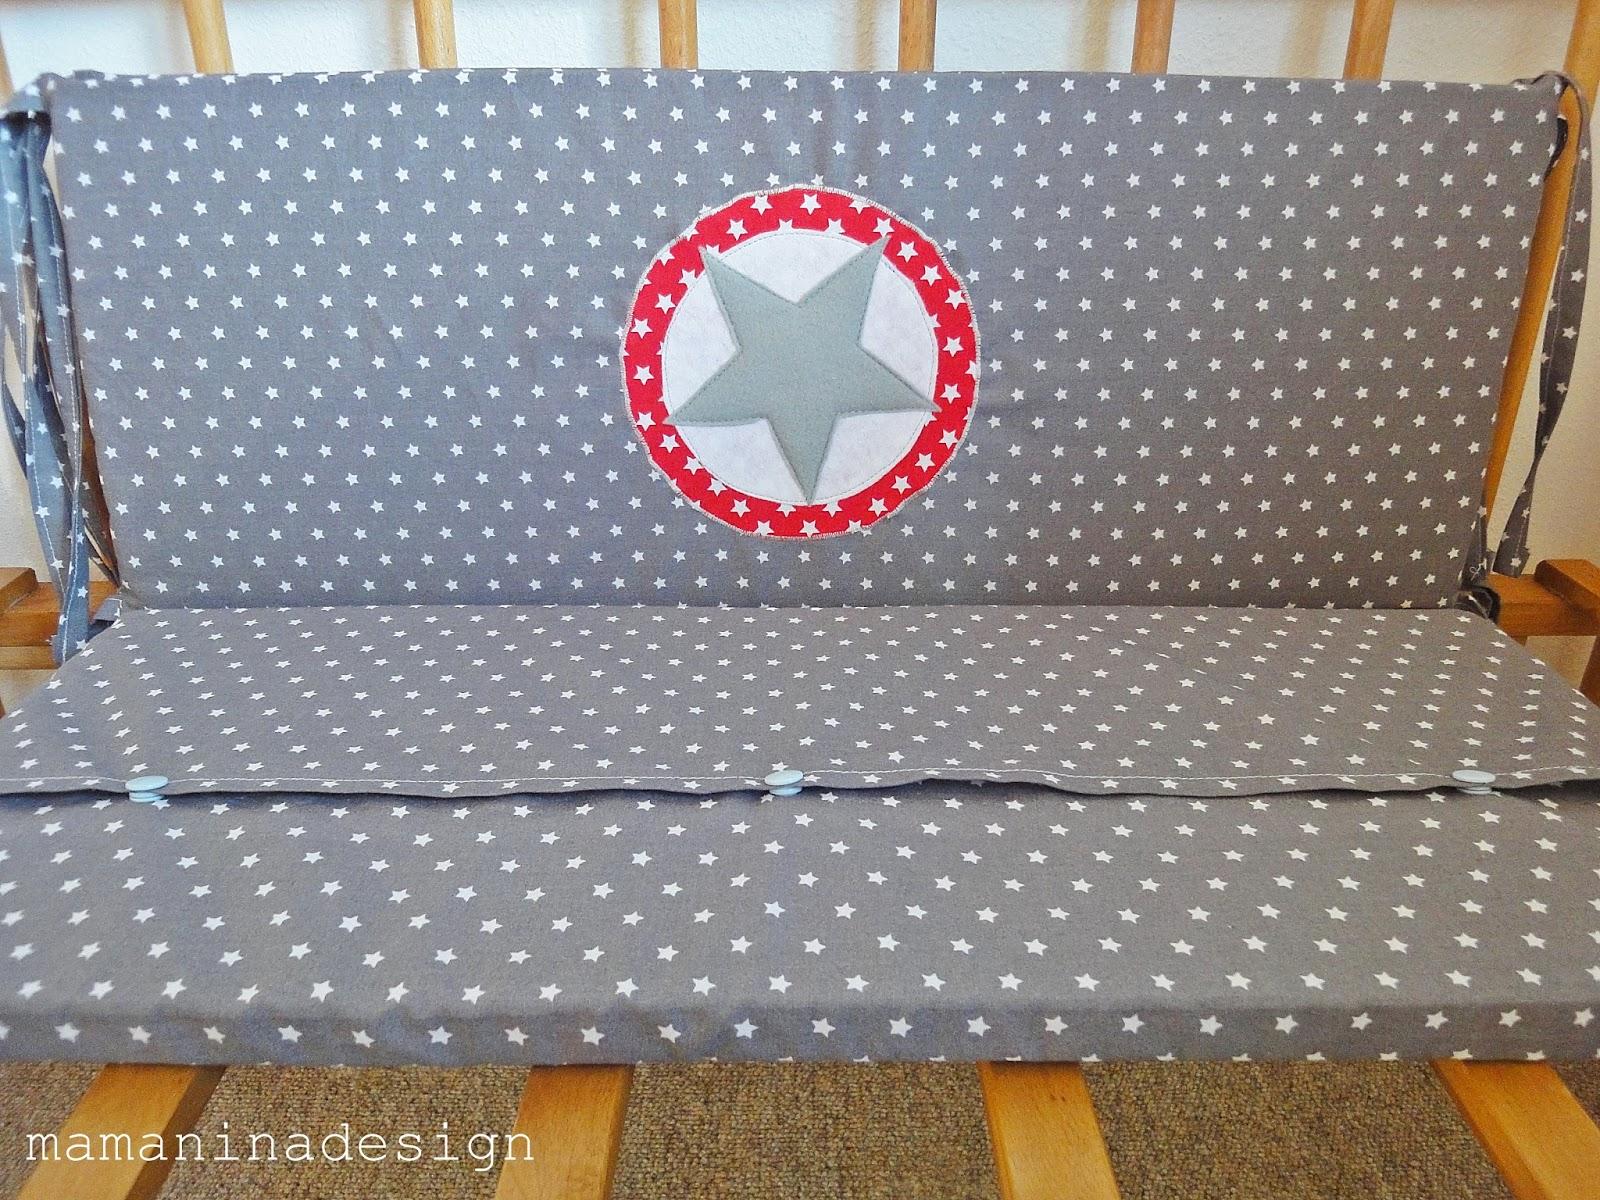 mama nina happy baby raketenstarkes nestchen. Black Bedroom Furniture Sets. Home Design Ideas